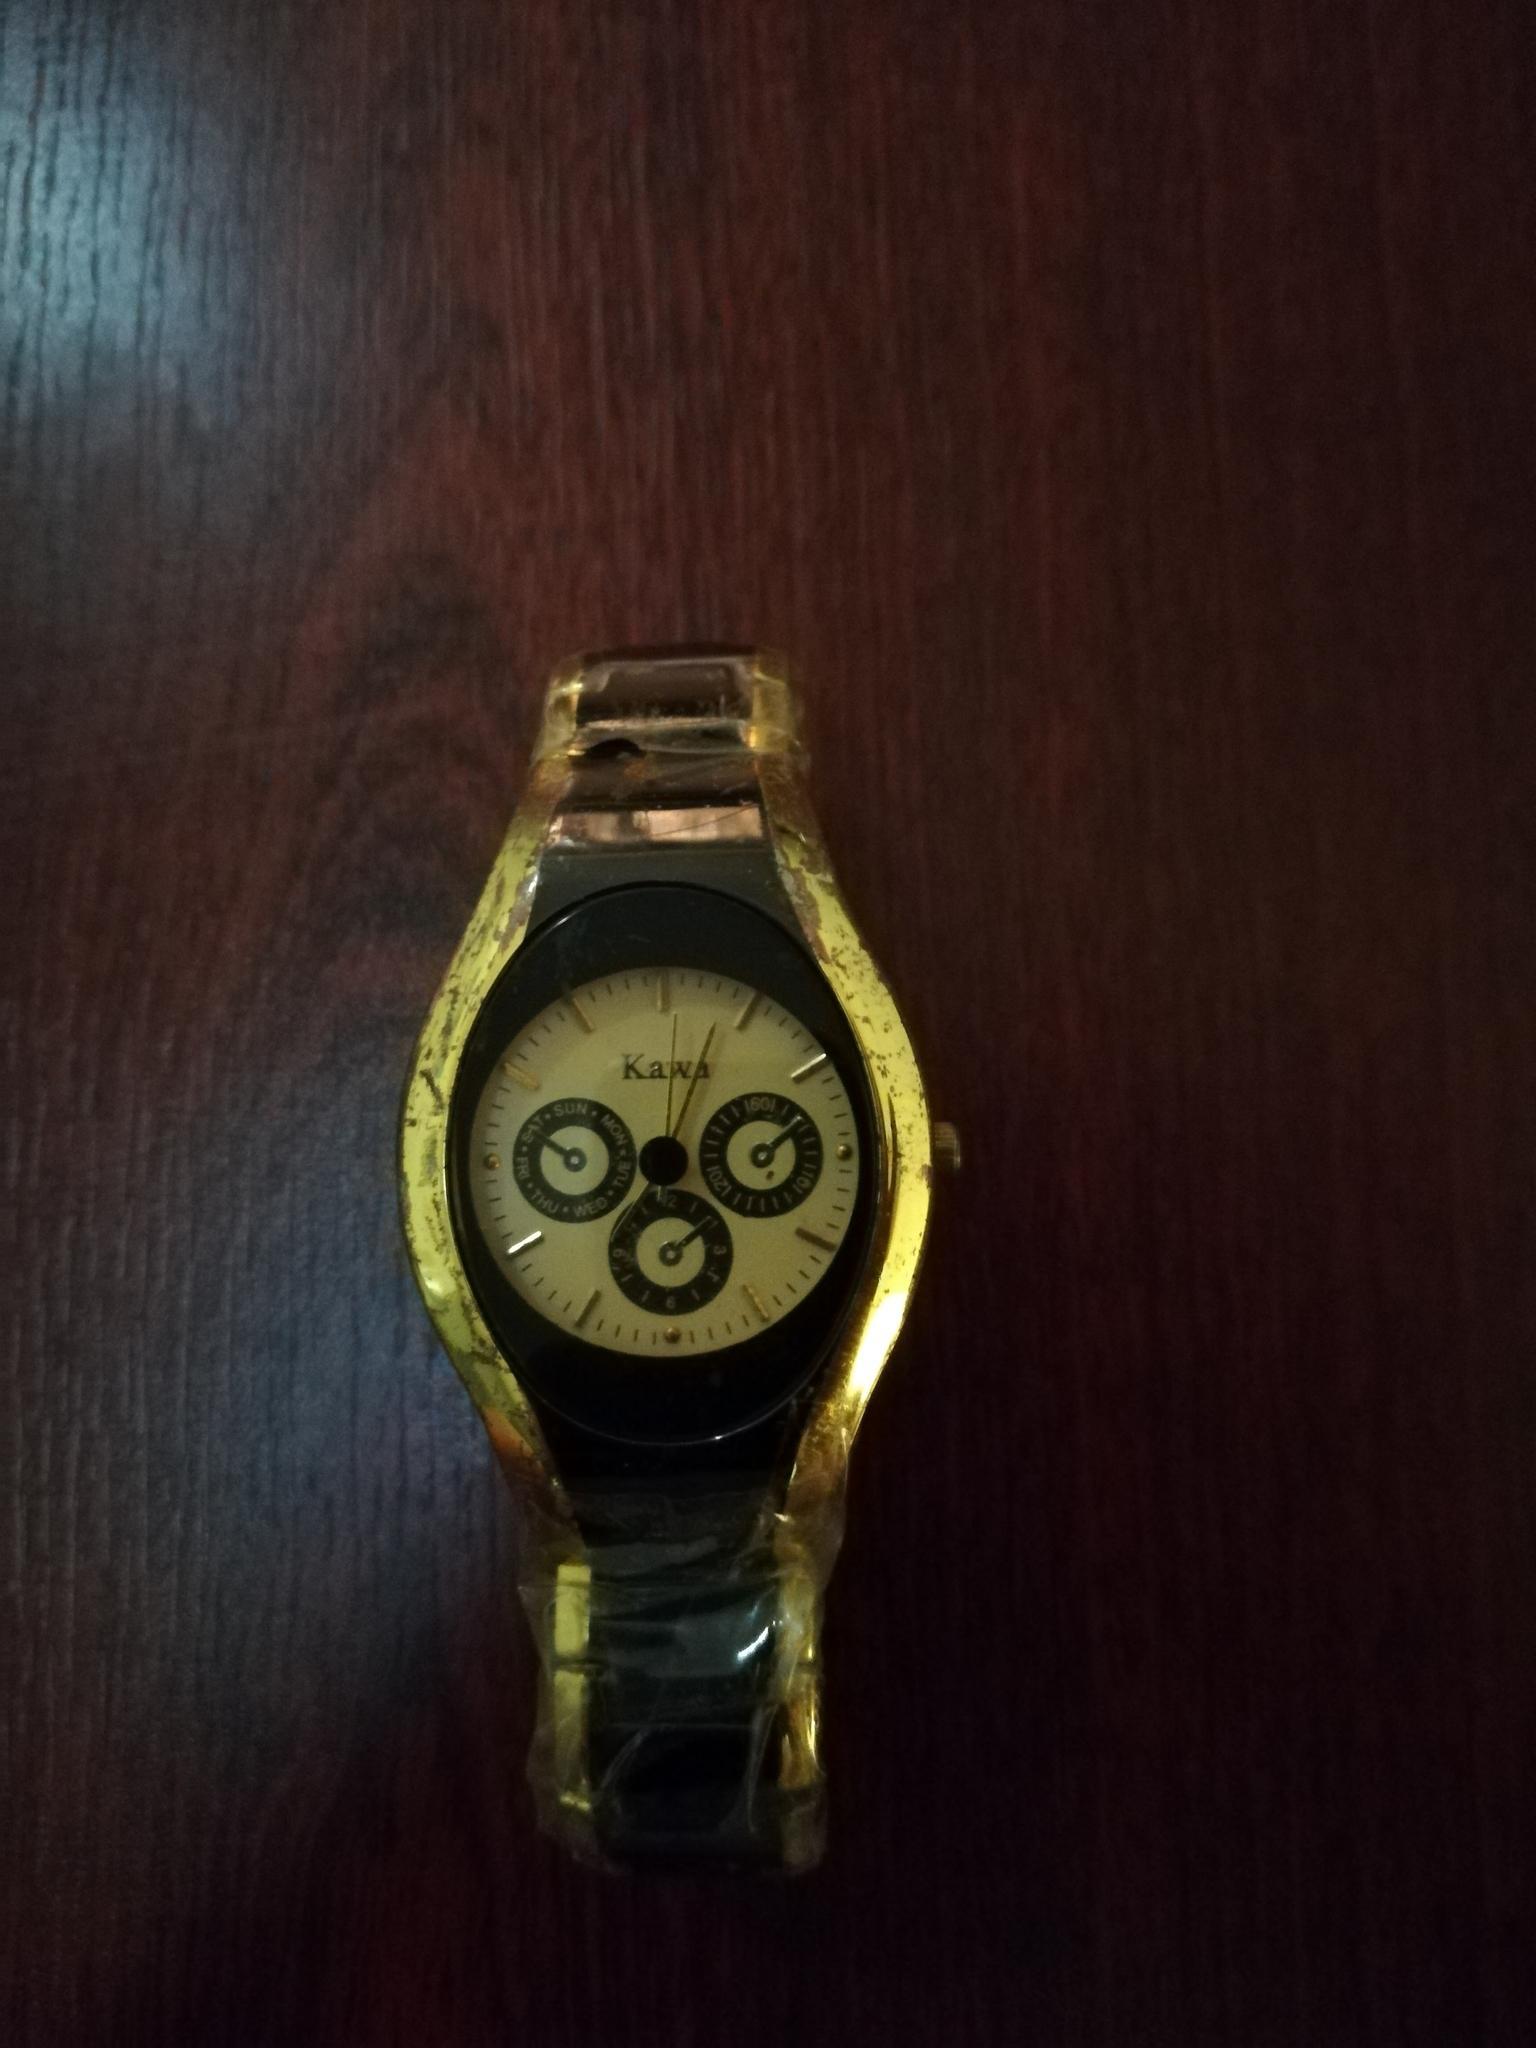 Original Kawa watch on an Offer price